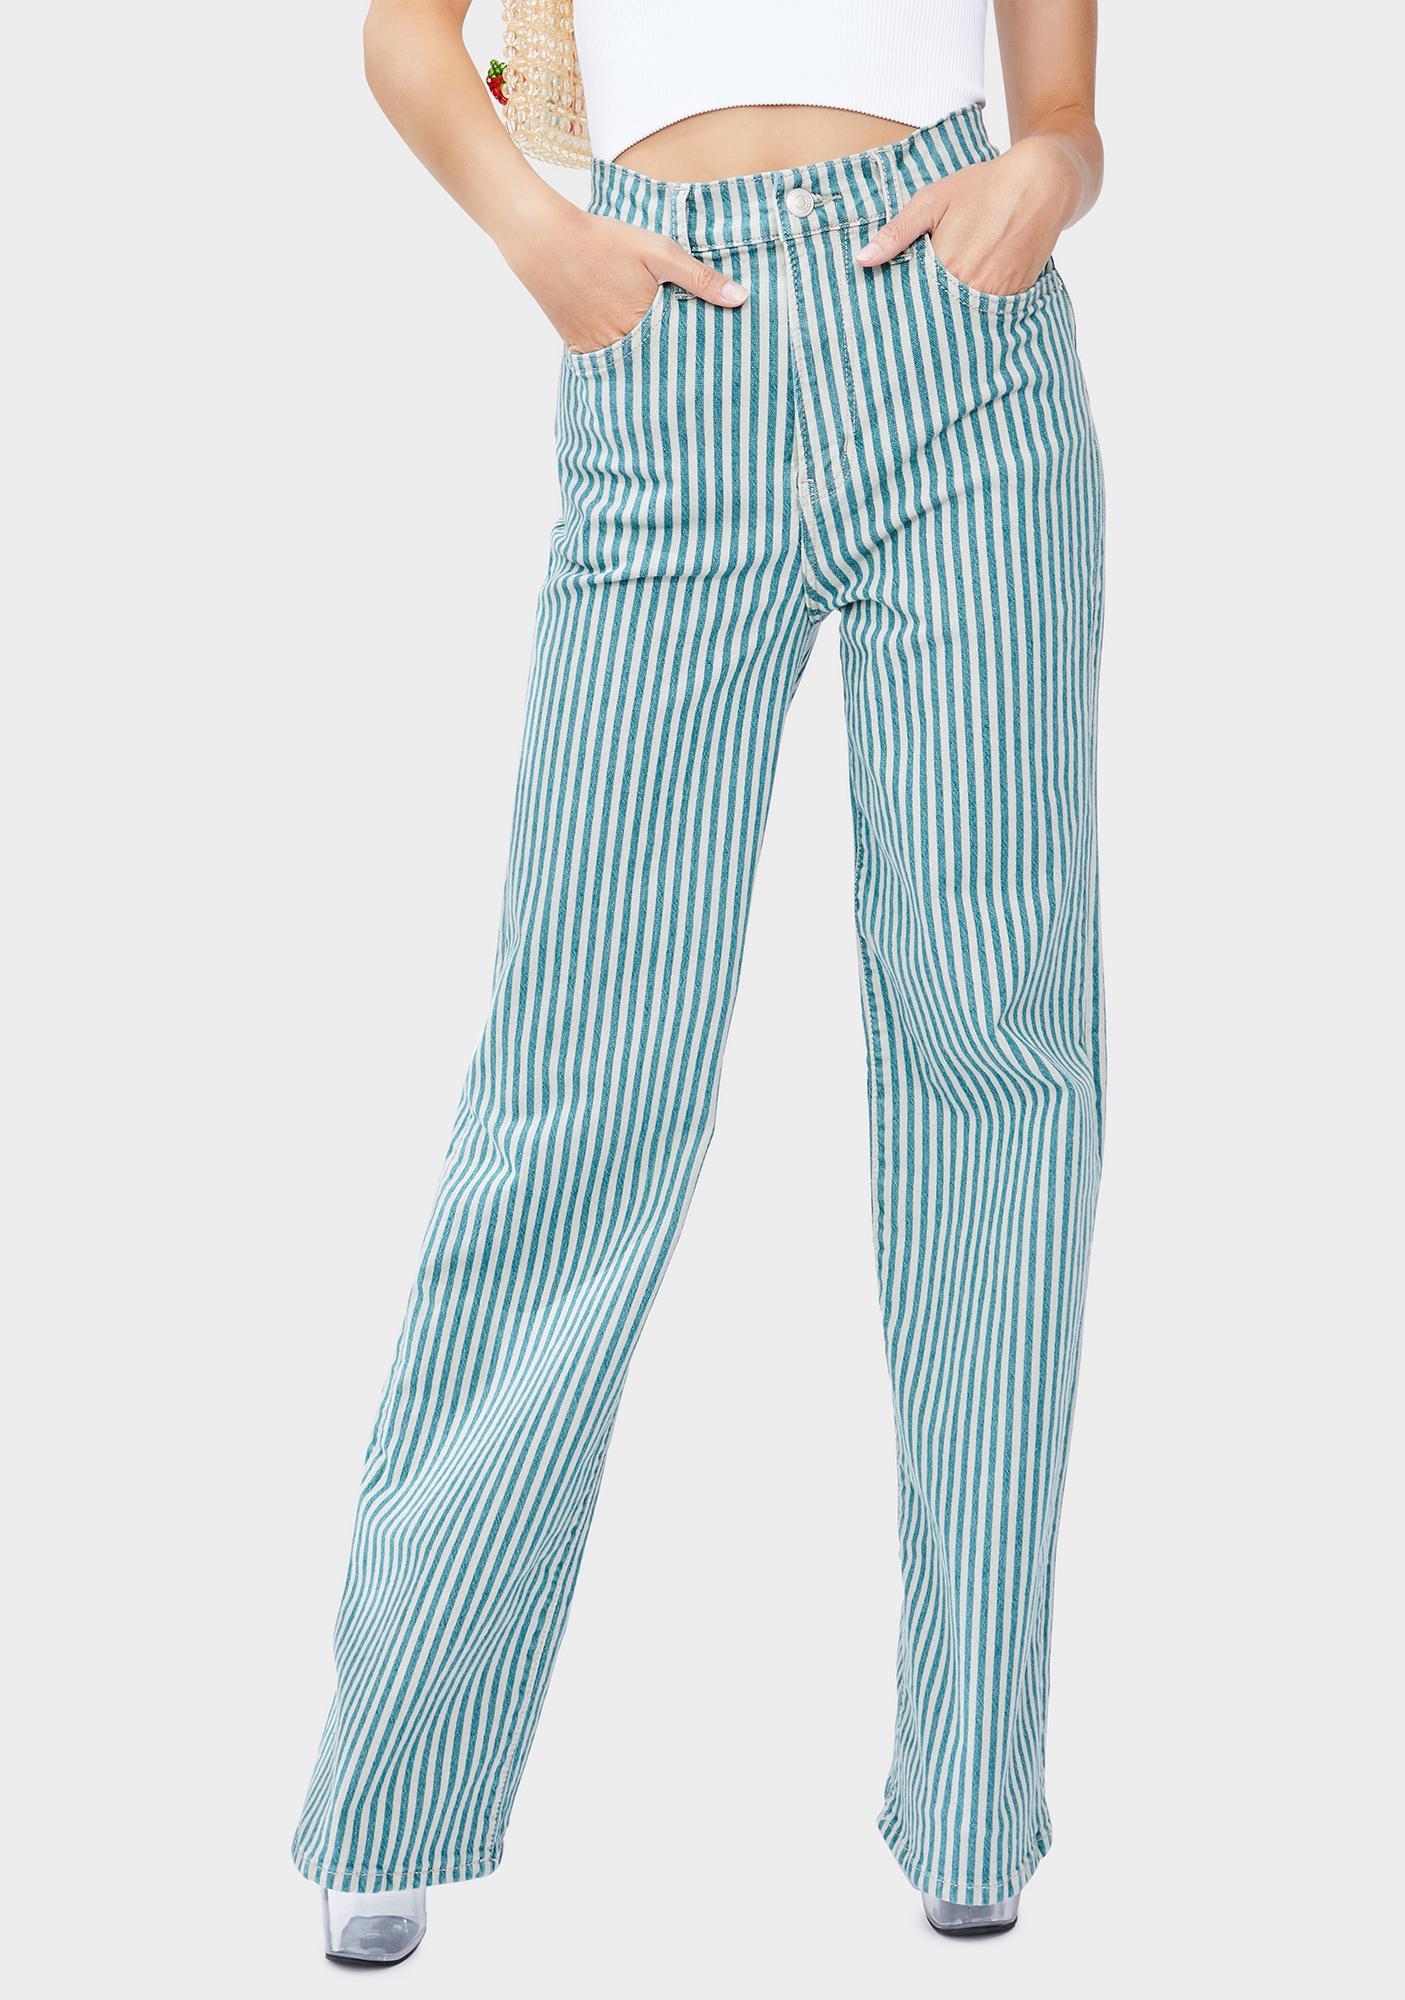 Free People Striped Astoria Wide Leg Jeans